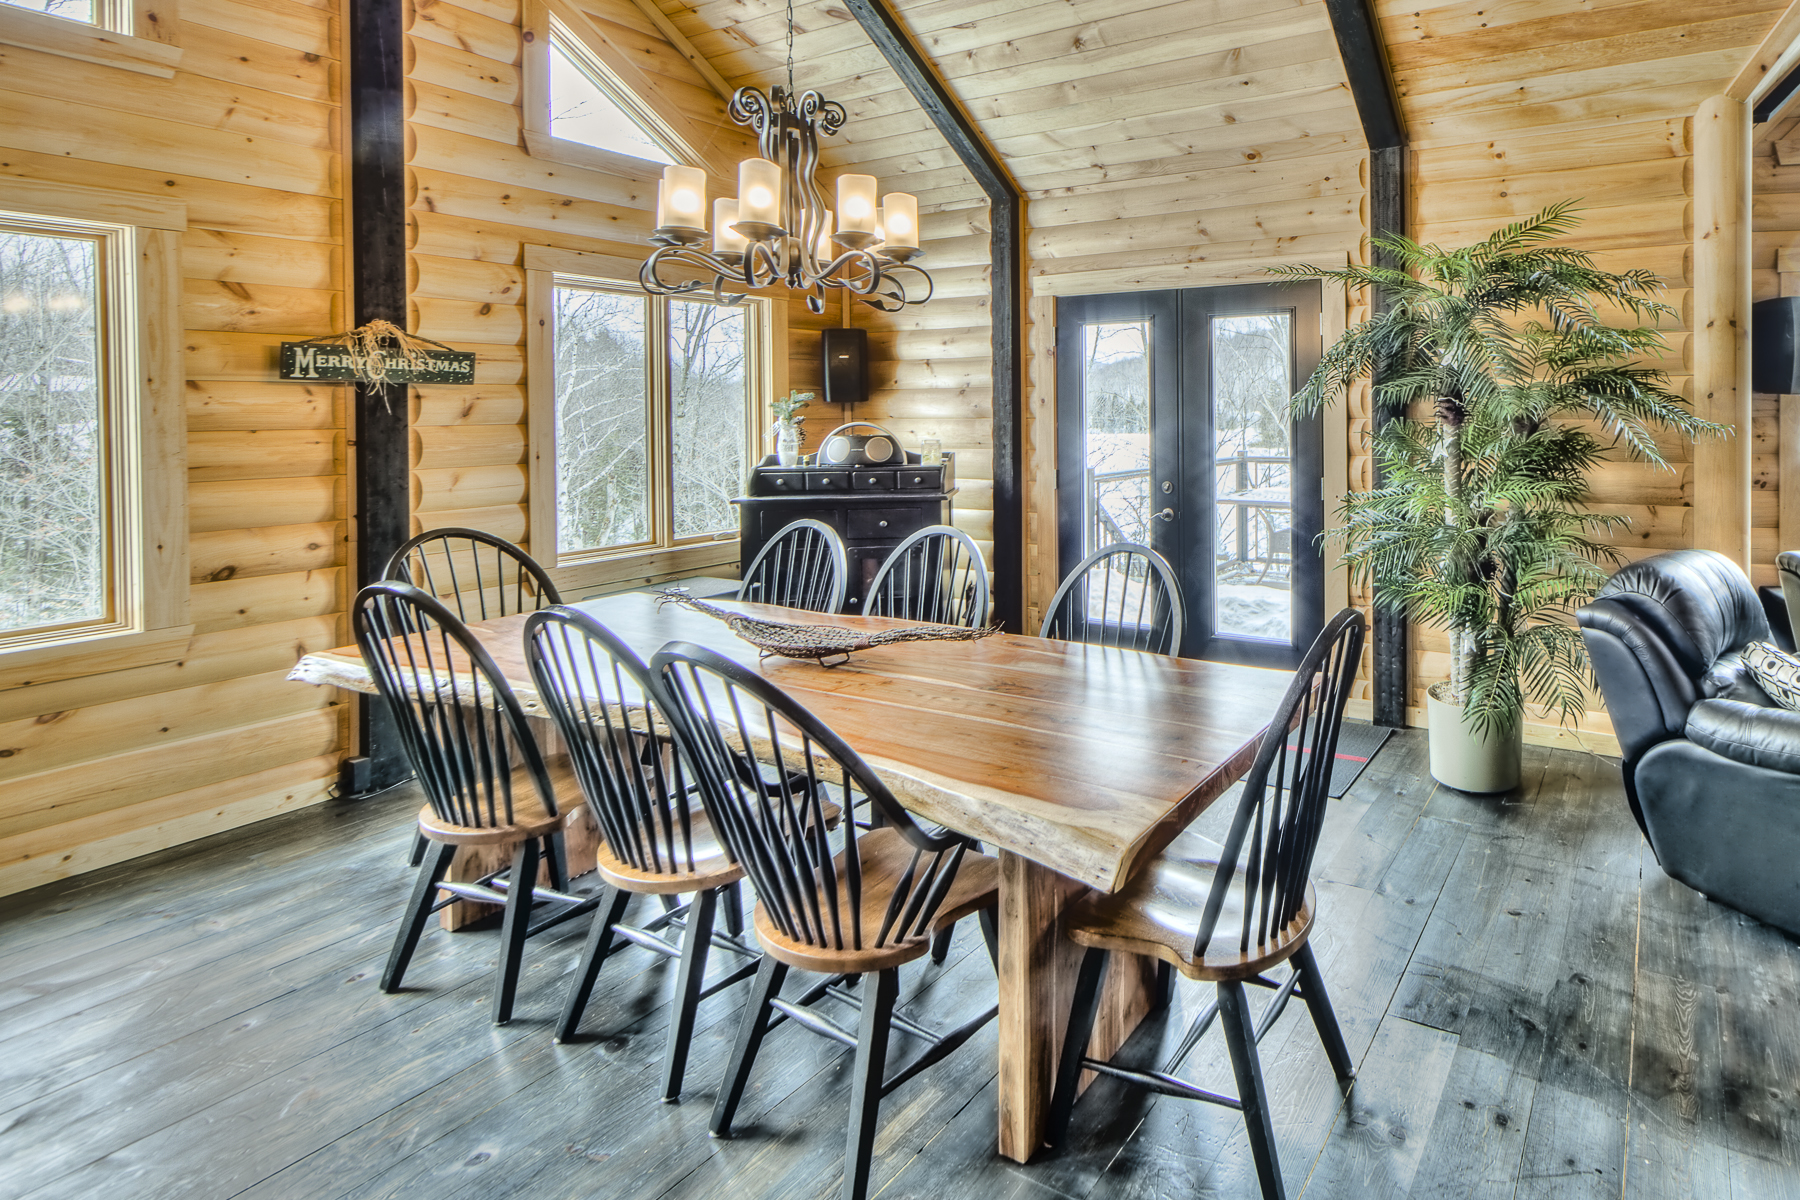 Christmas-dining room